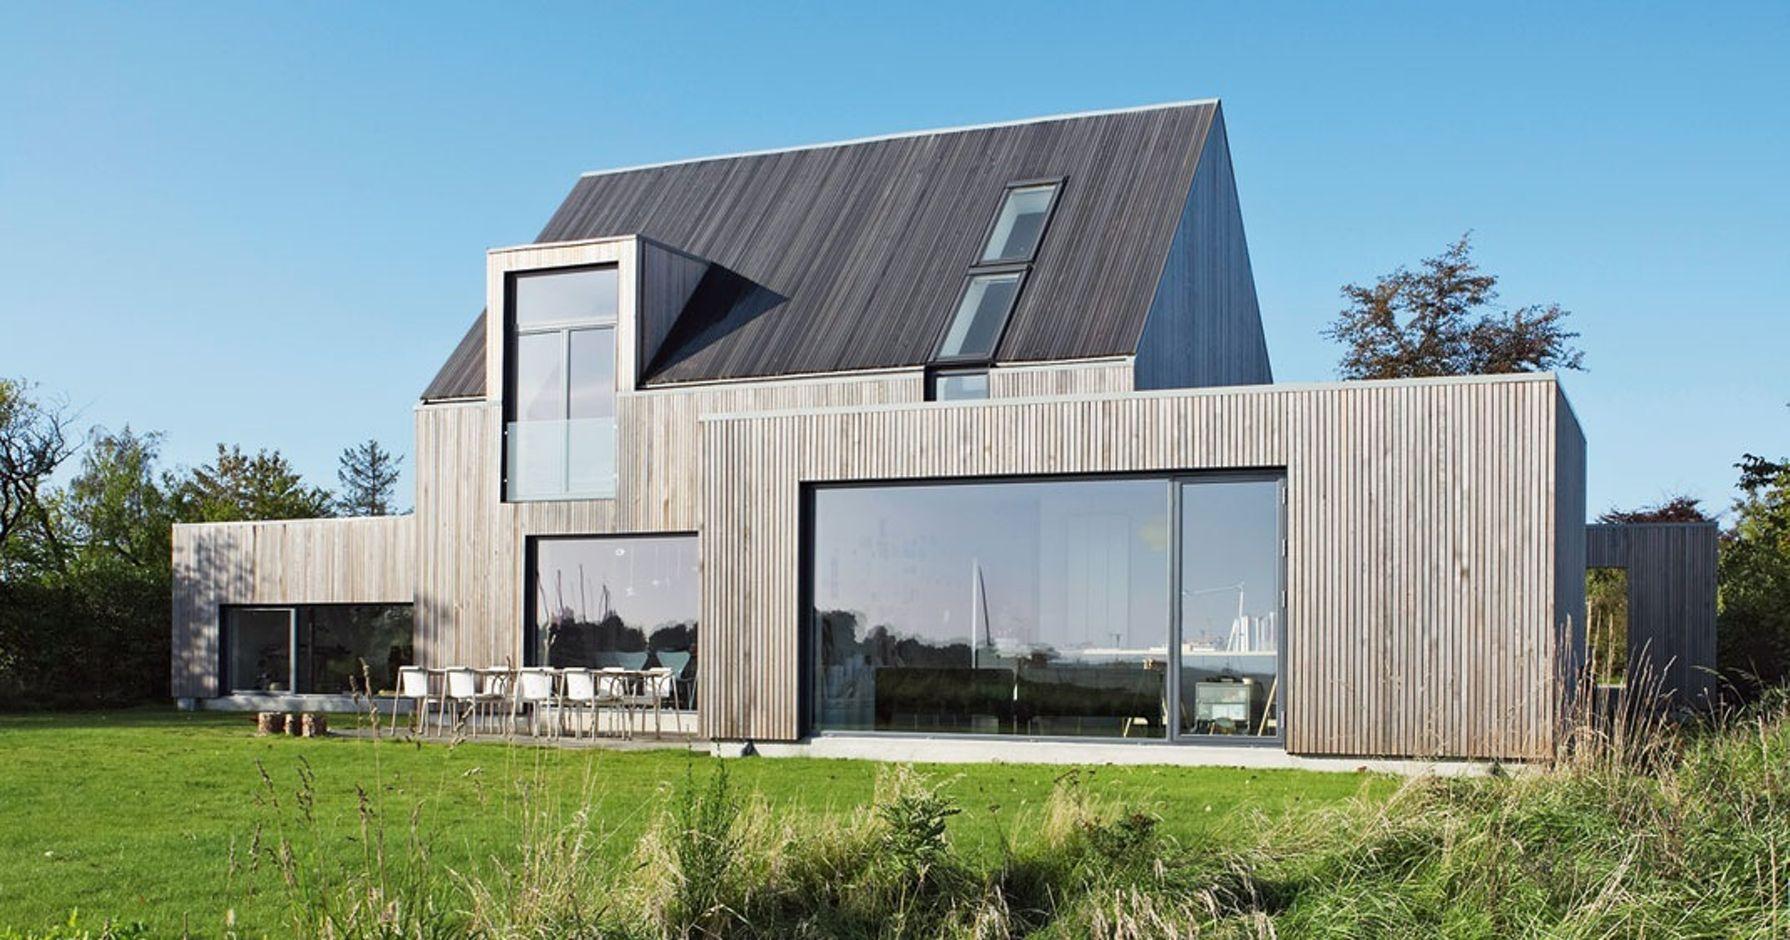 Moderner holzbau satteldach  Moderne tilbygg | LIBERTY GROVE | Pinterest | Hausfassaden ...